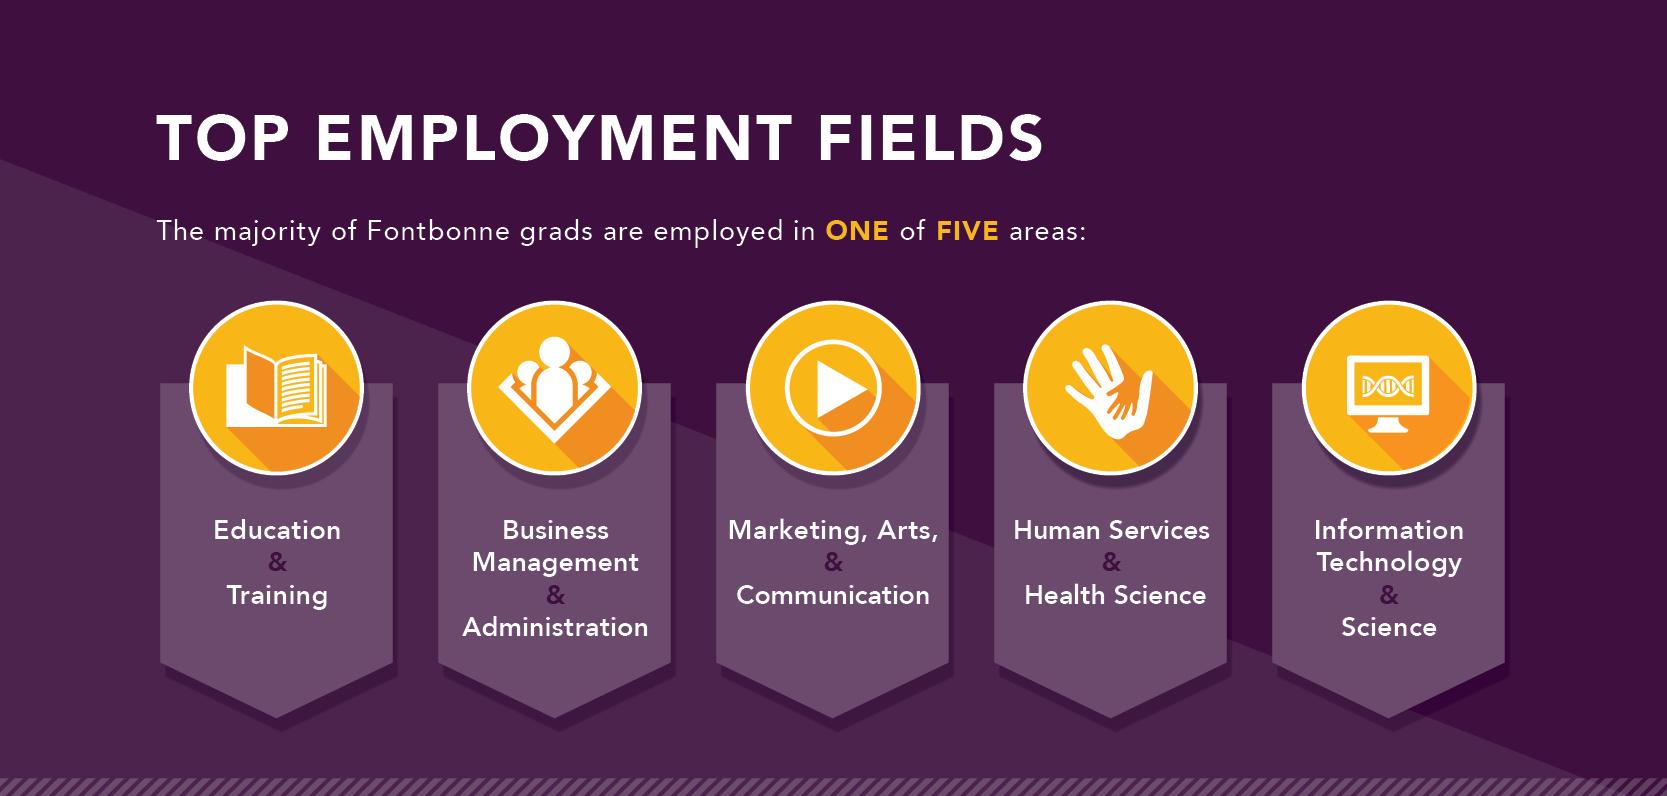 Fontbonne University top employment fields graphic